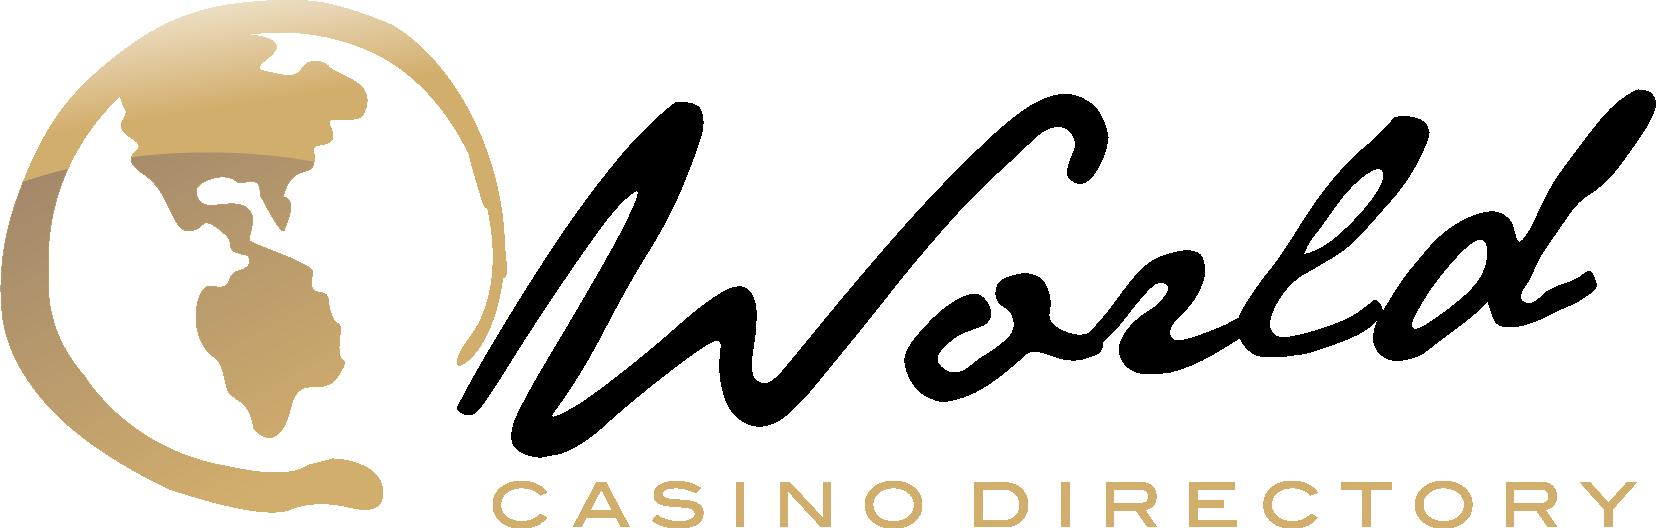 65 Live casino Chile comprar loteria navidad 2019-373841